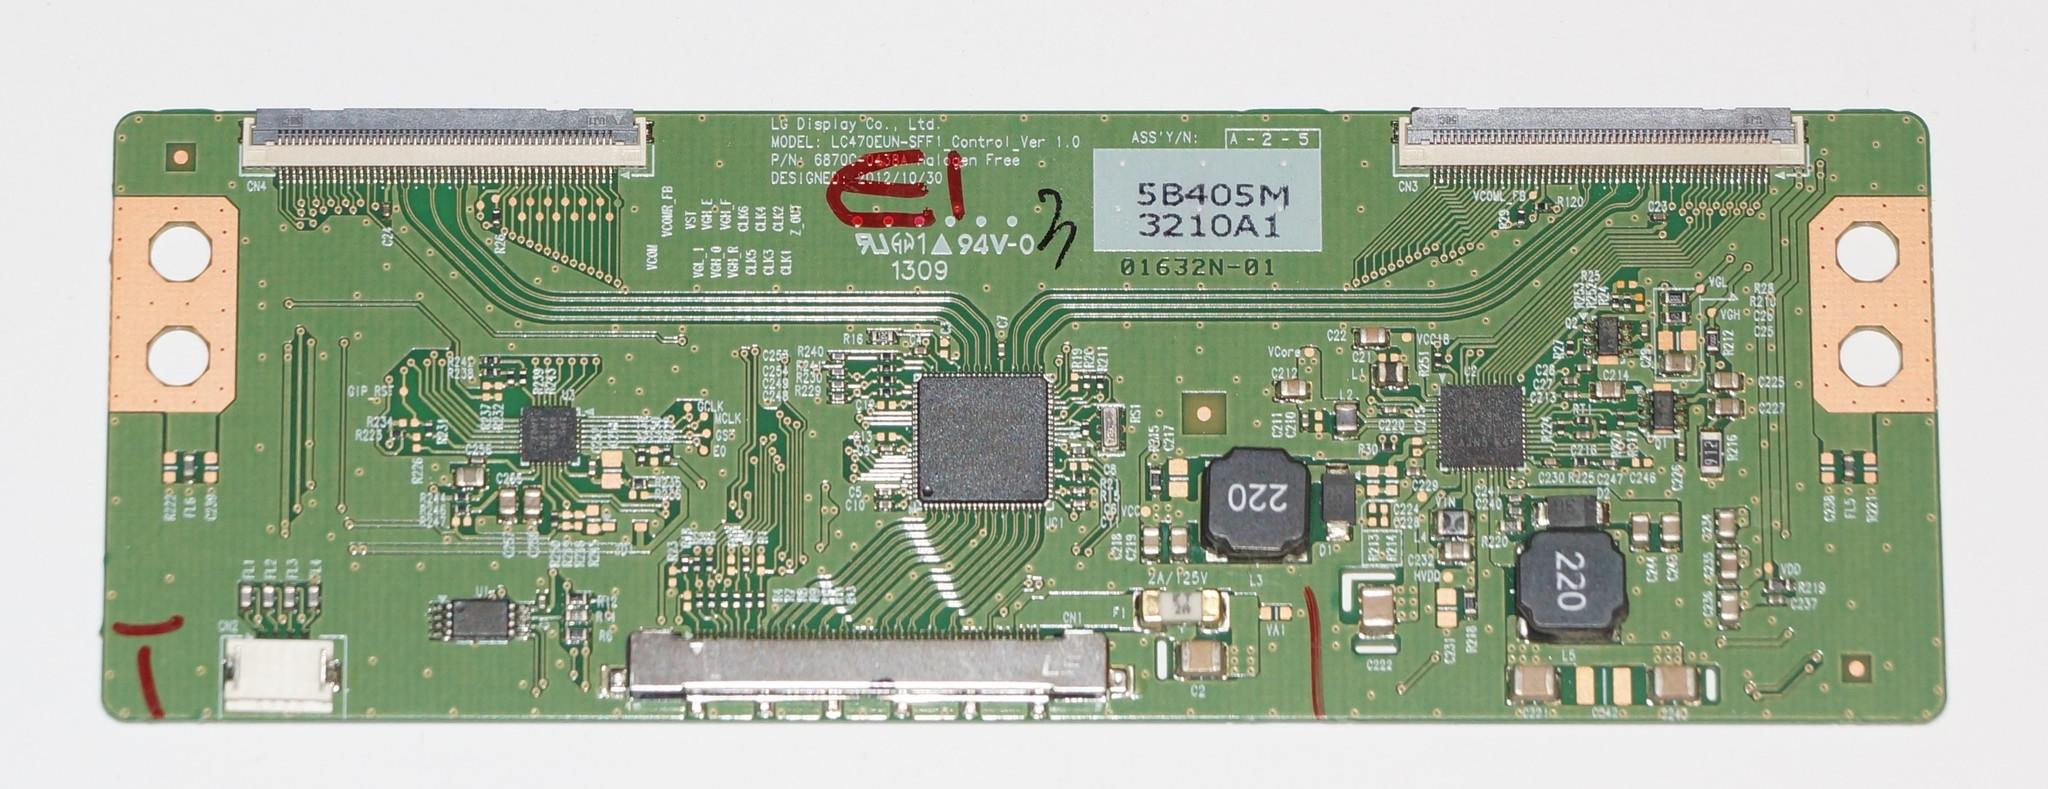 6870C-0438A t-con телевизора Panasonic, Philips